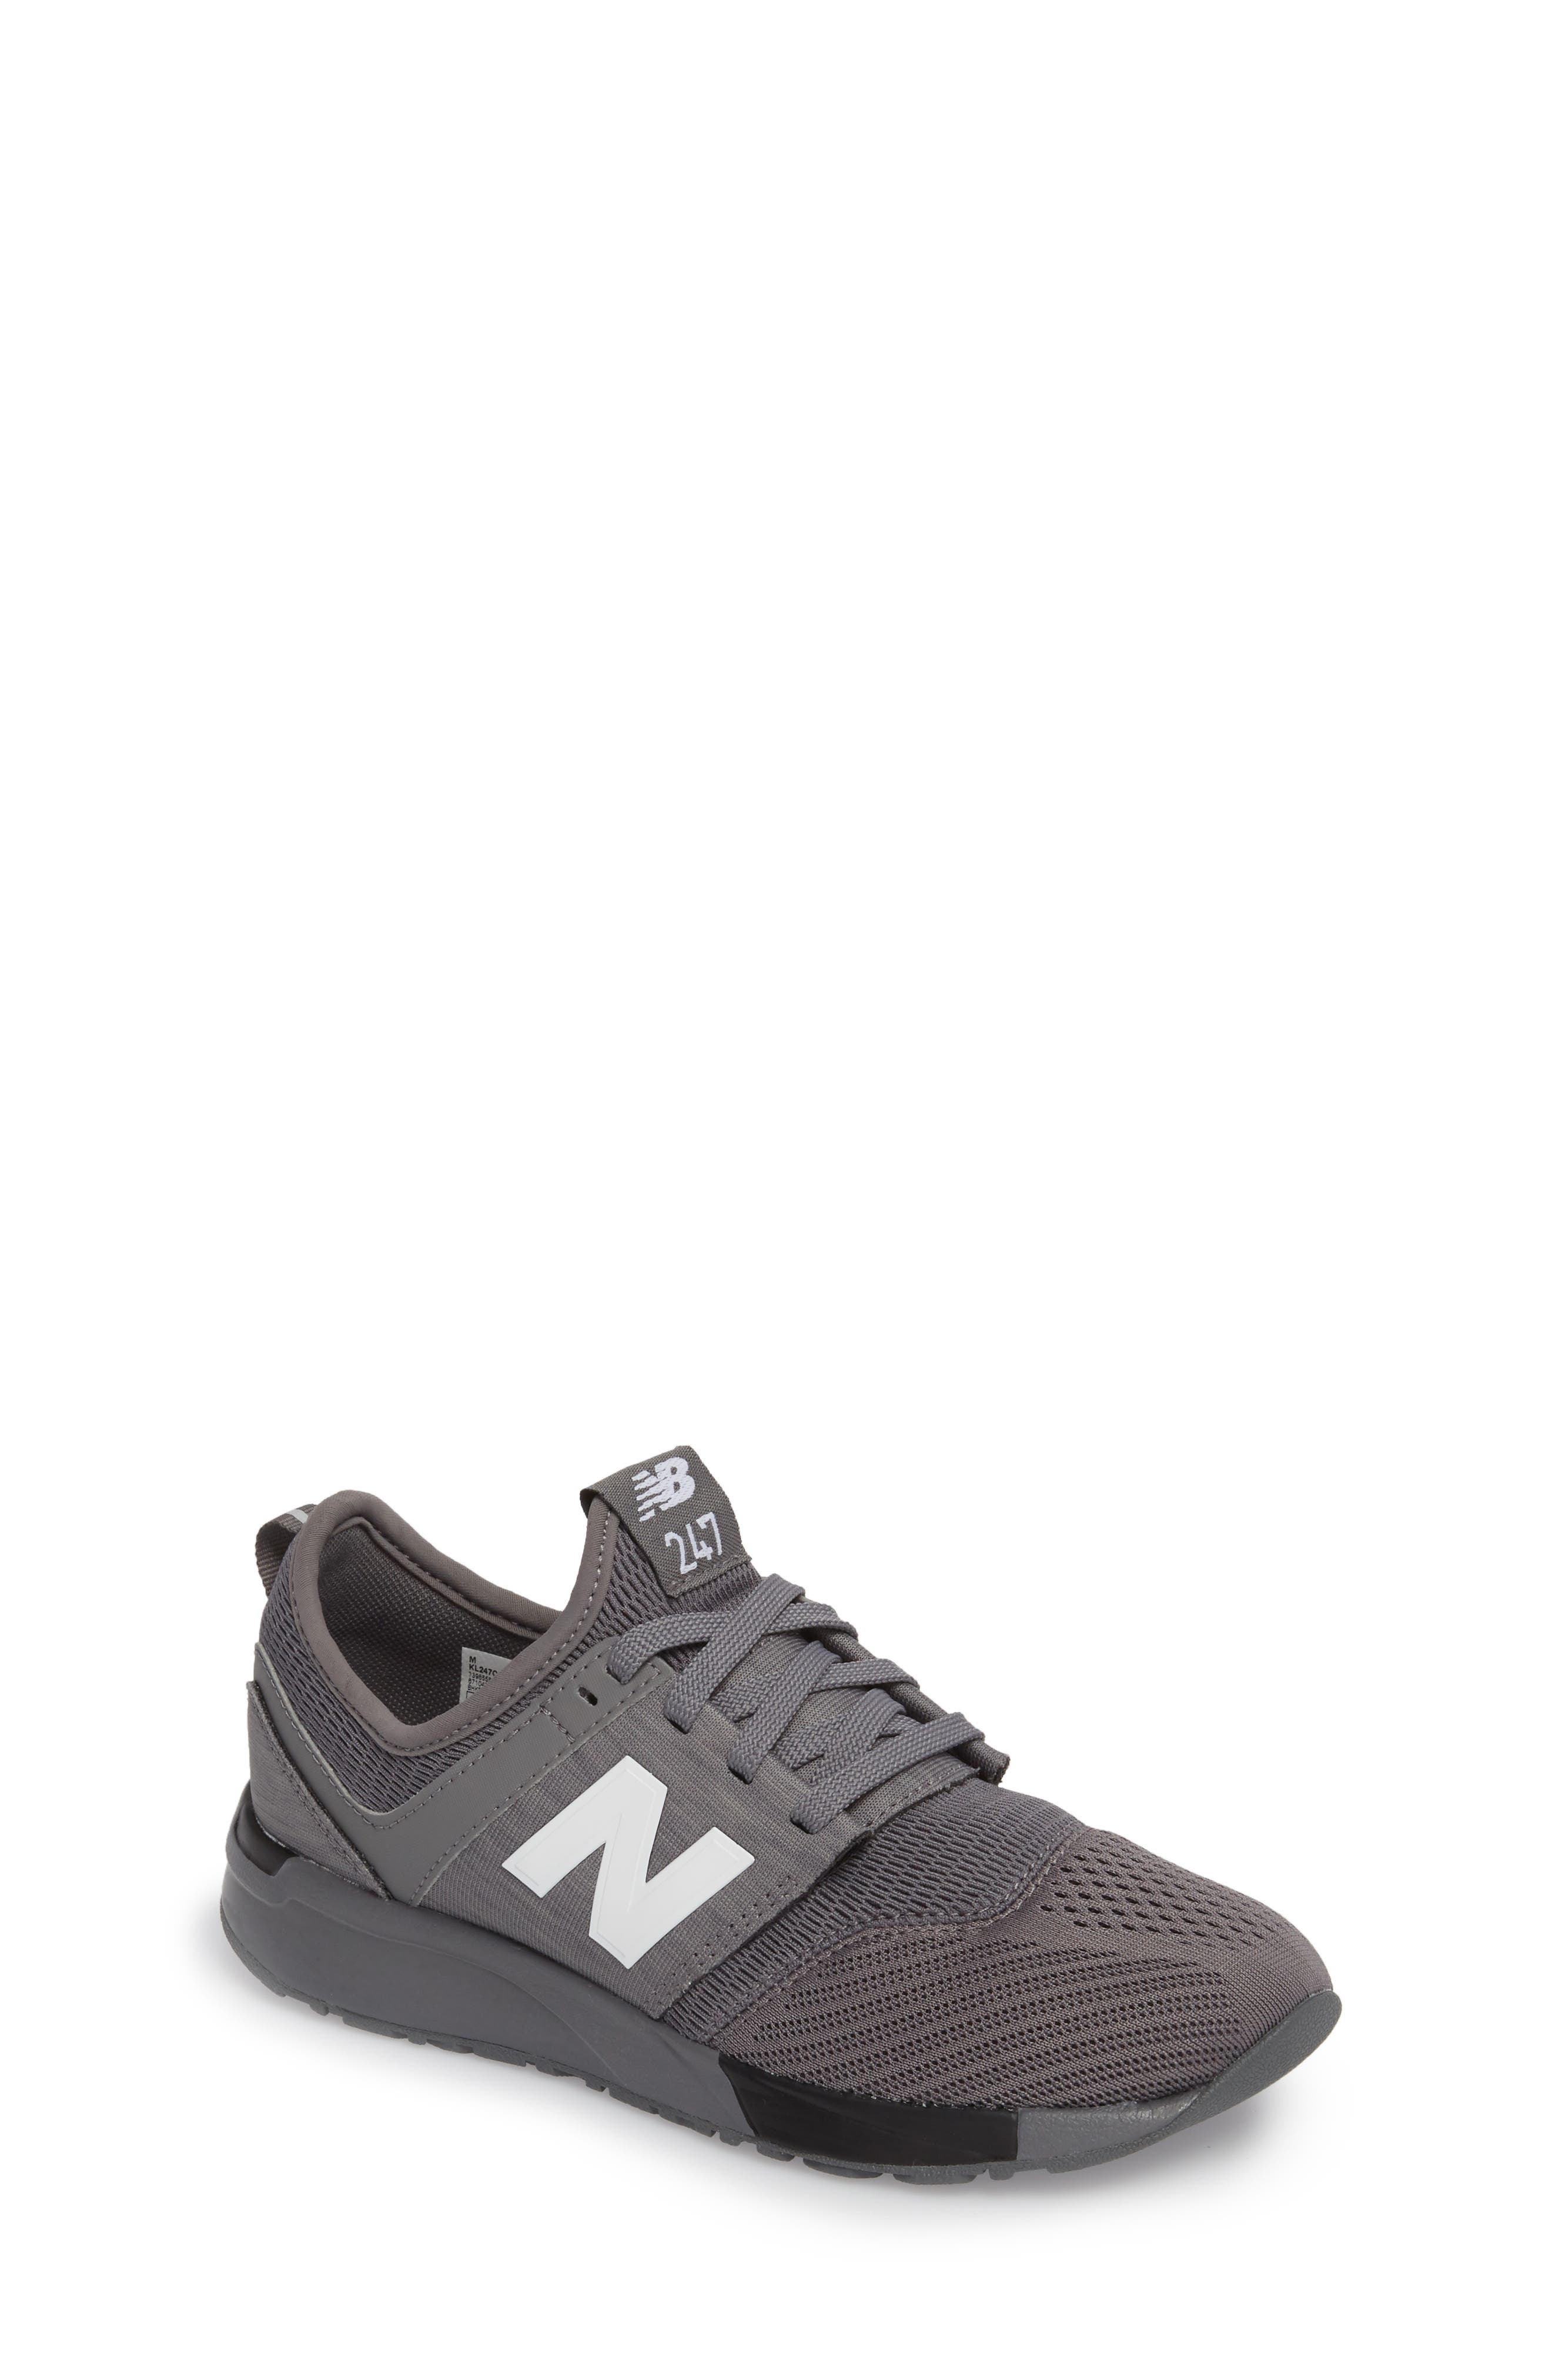 247 Sport Sneaker,                             Main thumbnail 1, color,                             Grey/ Black